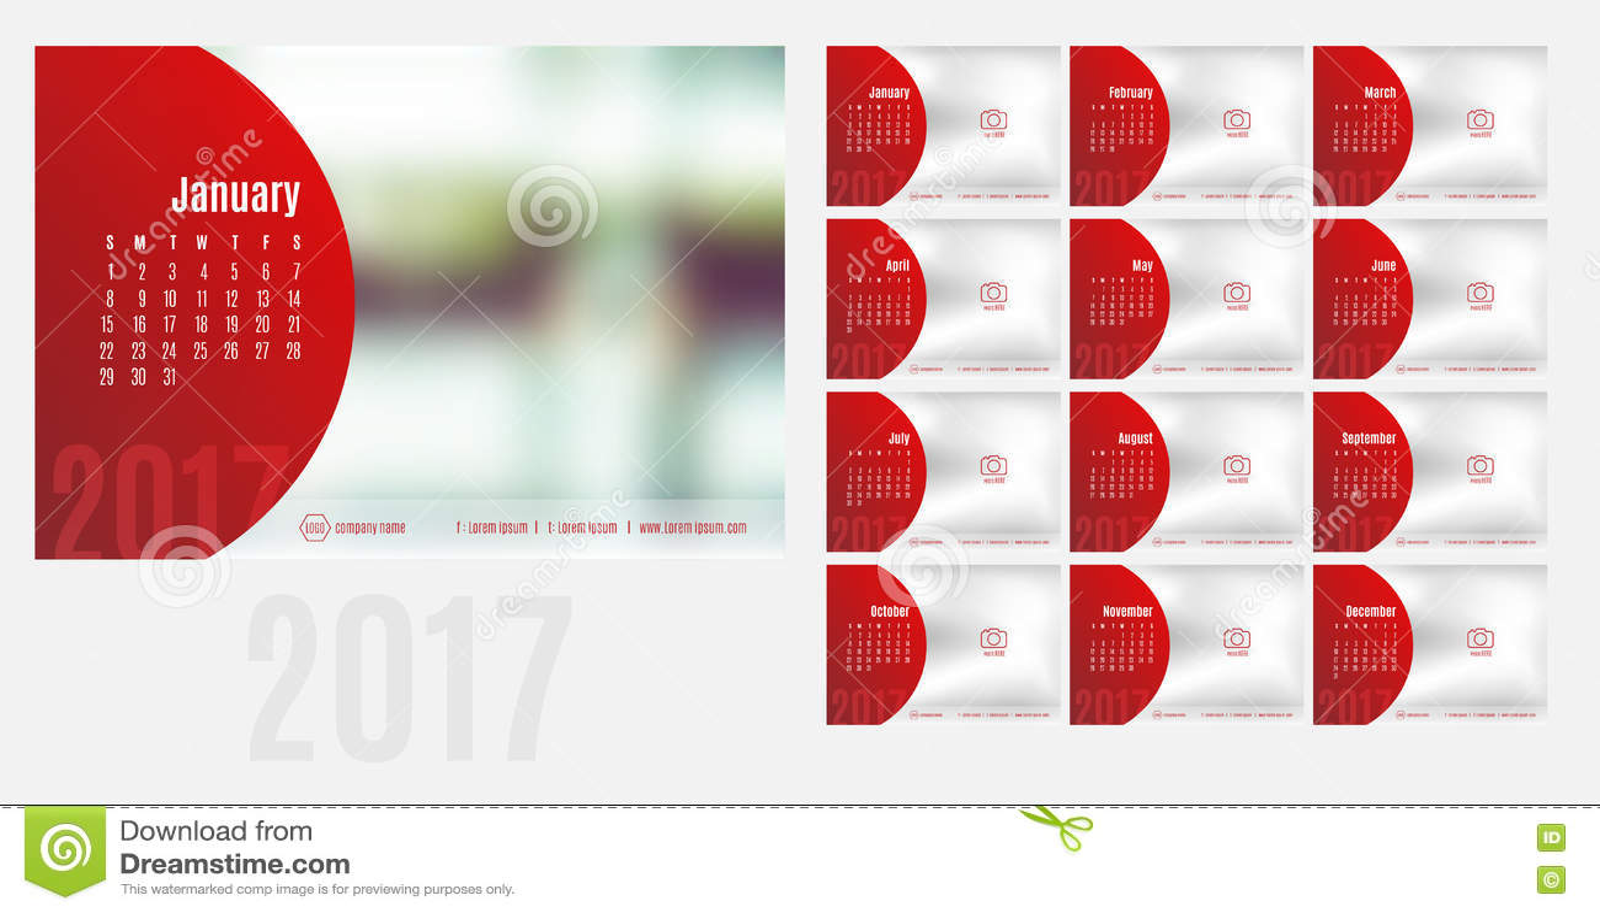 Vector of calendar 2017 year 12 month calendar with - Calendrier design ...